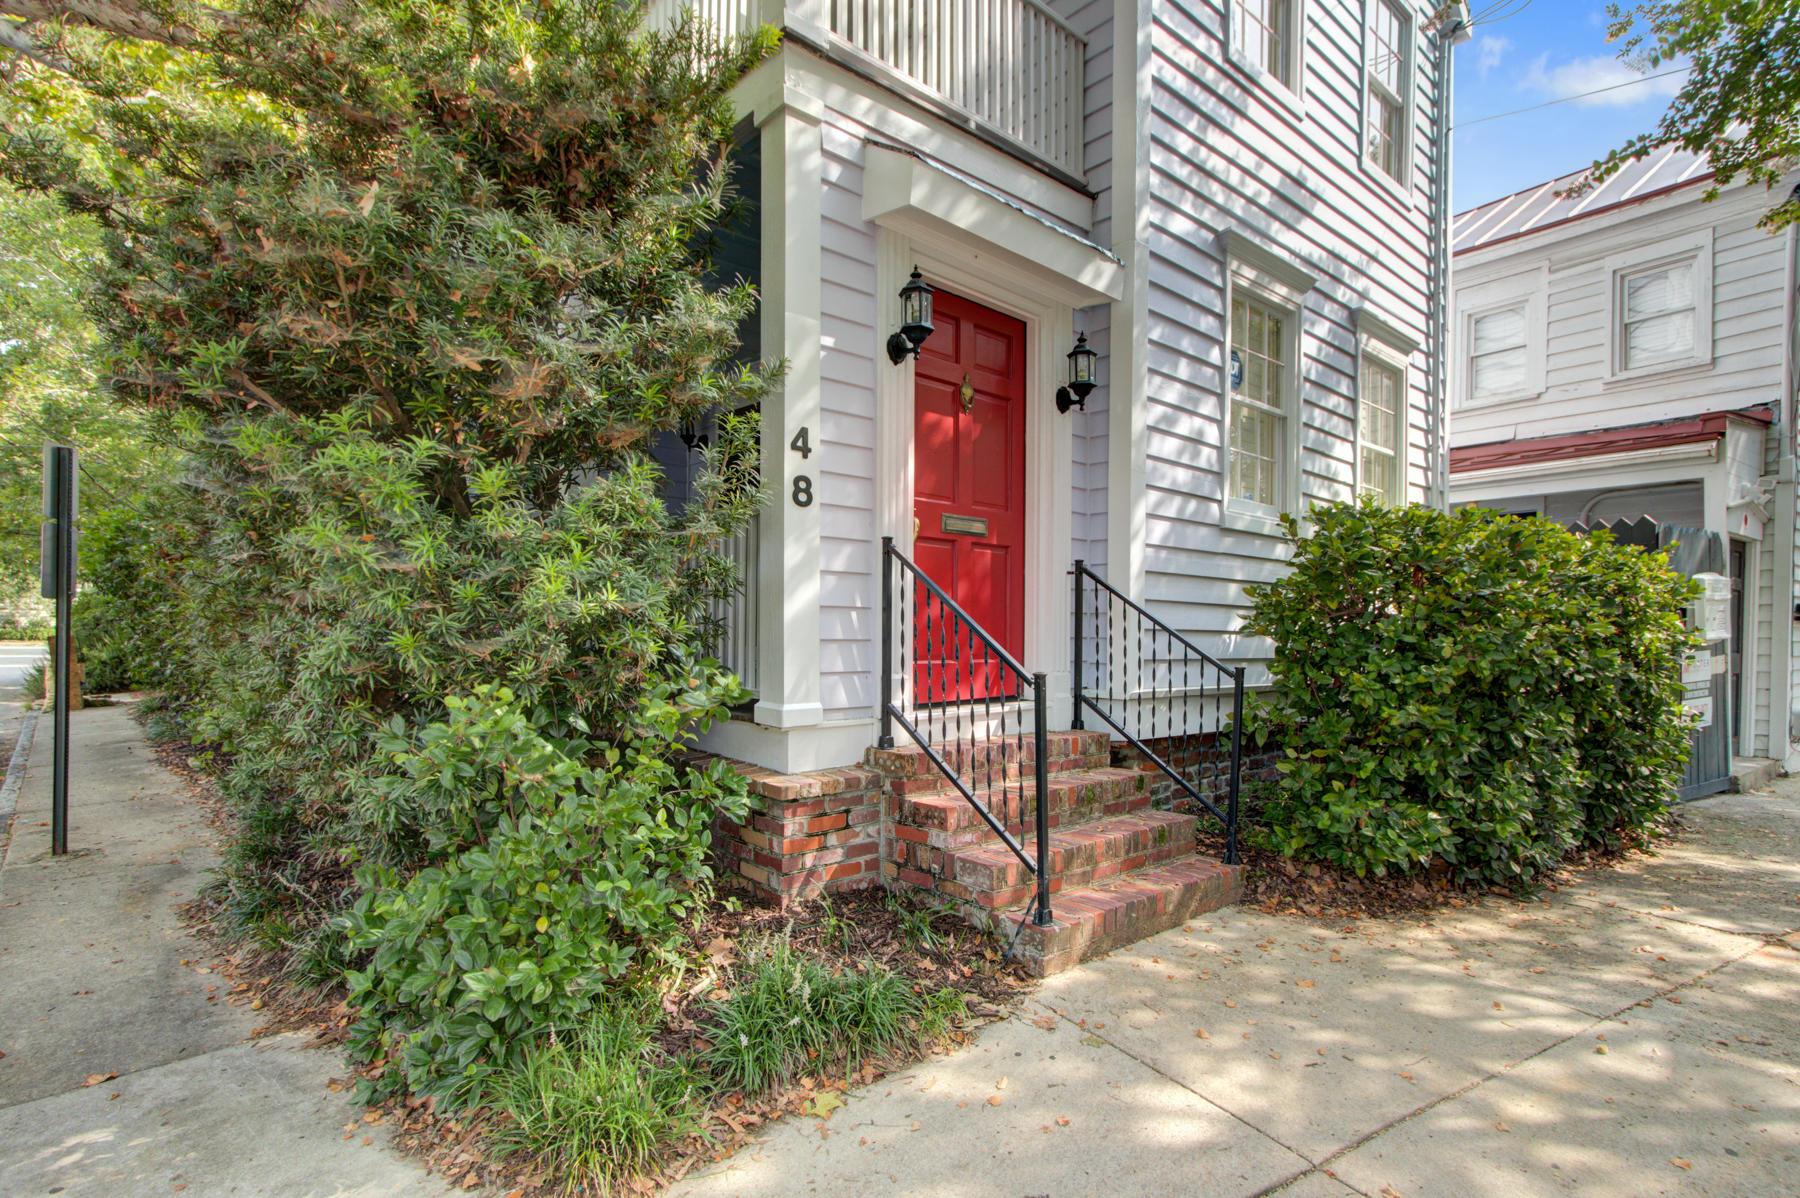 Radcliffeborough Homes For Sale - 48 Radcliffe, Charleston, SC - 18